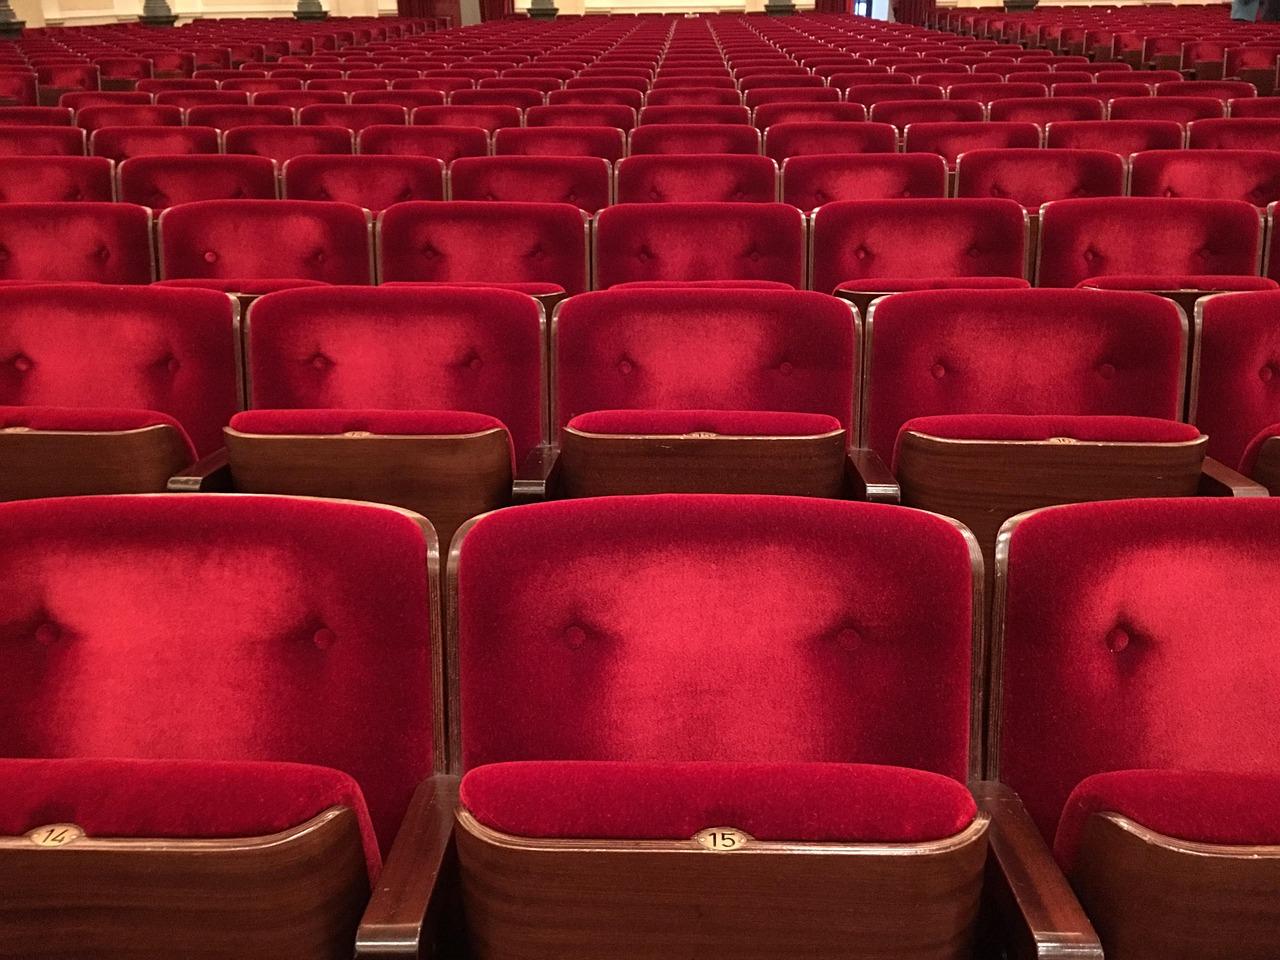 theatre-1234481_1280